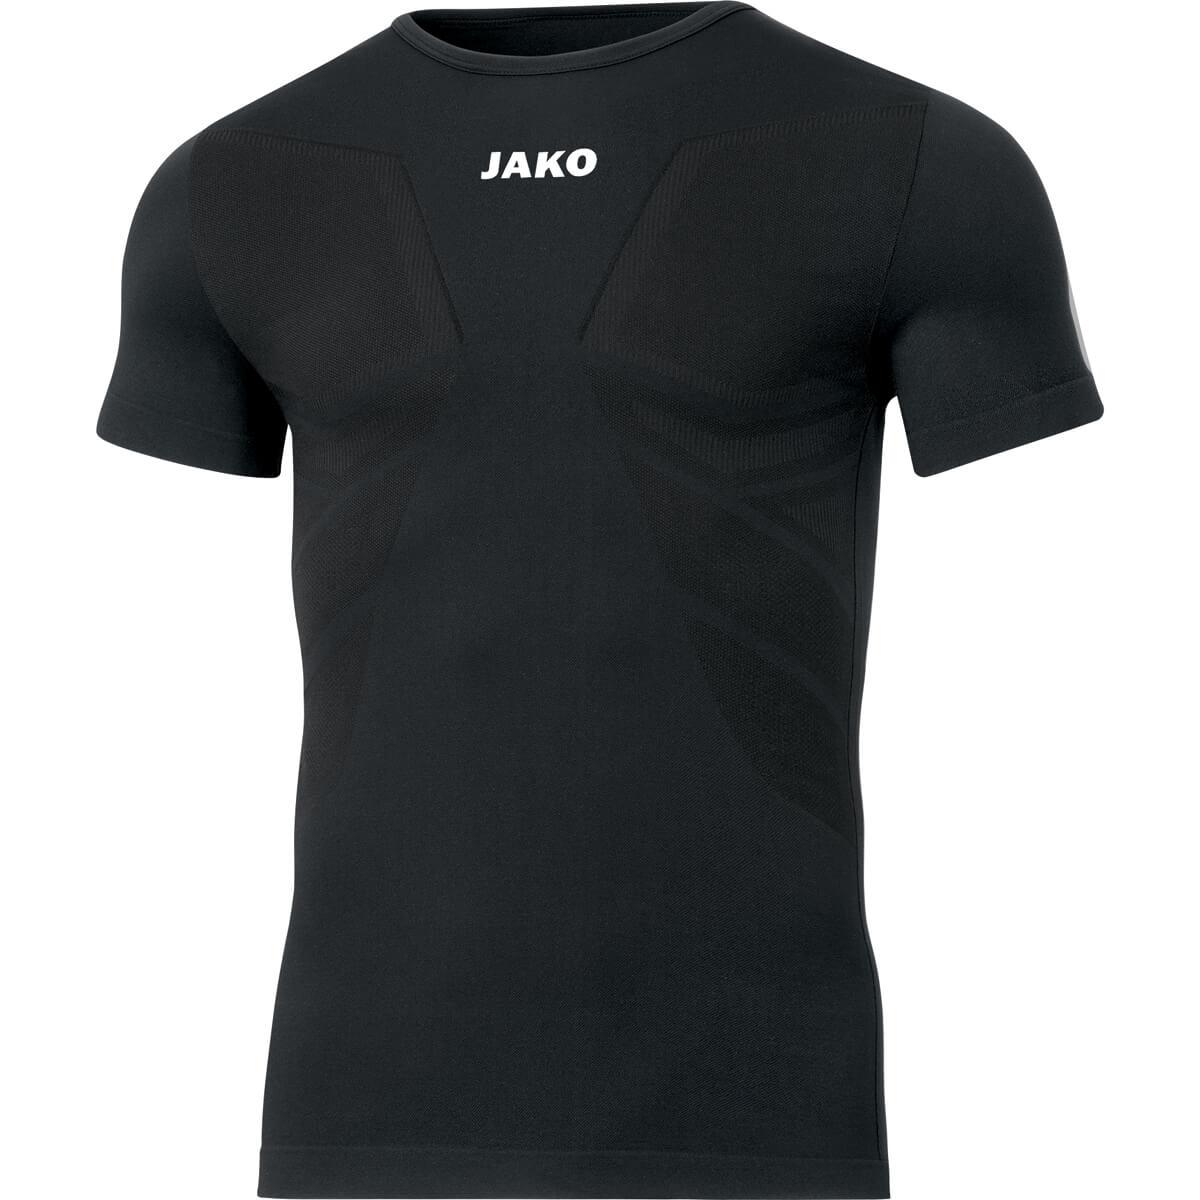 Jako T-Shirt Comfort 2.0 Herren 6155  | div. Größen / Farben